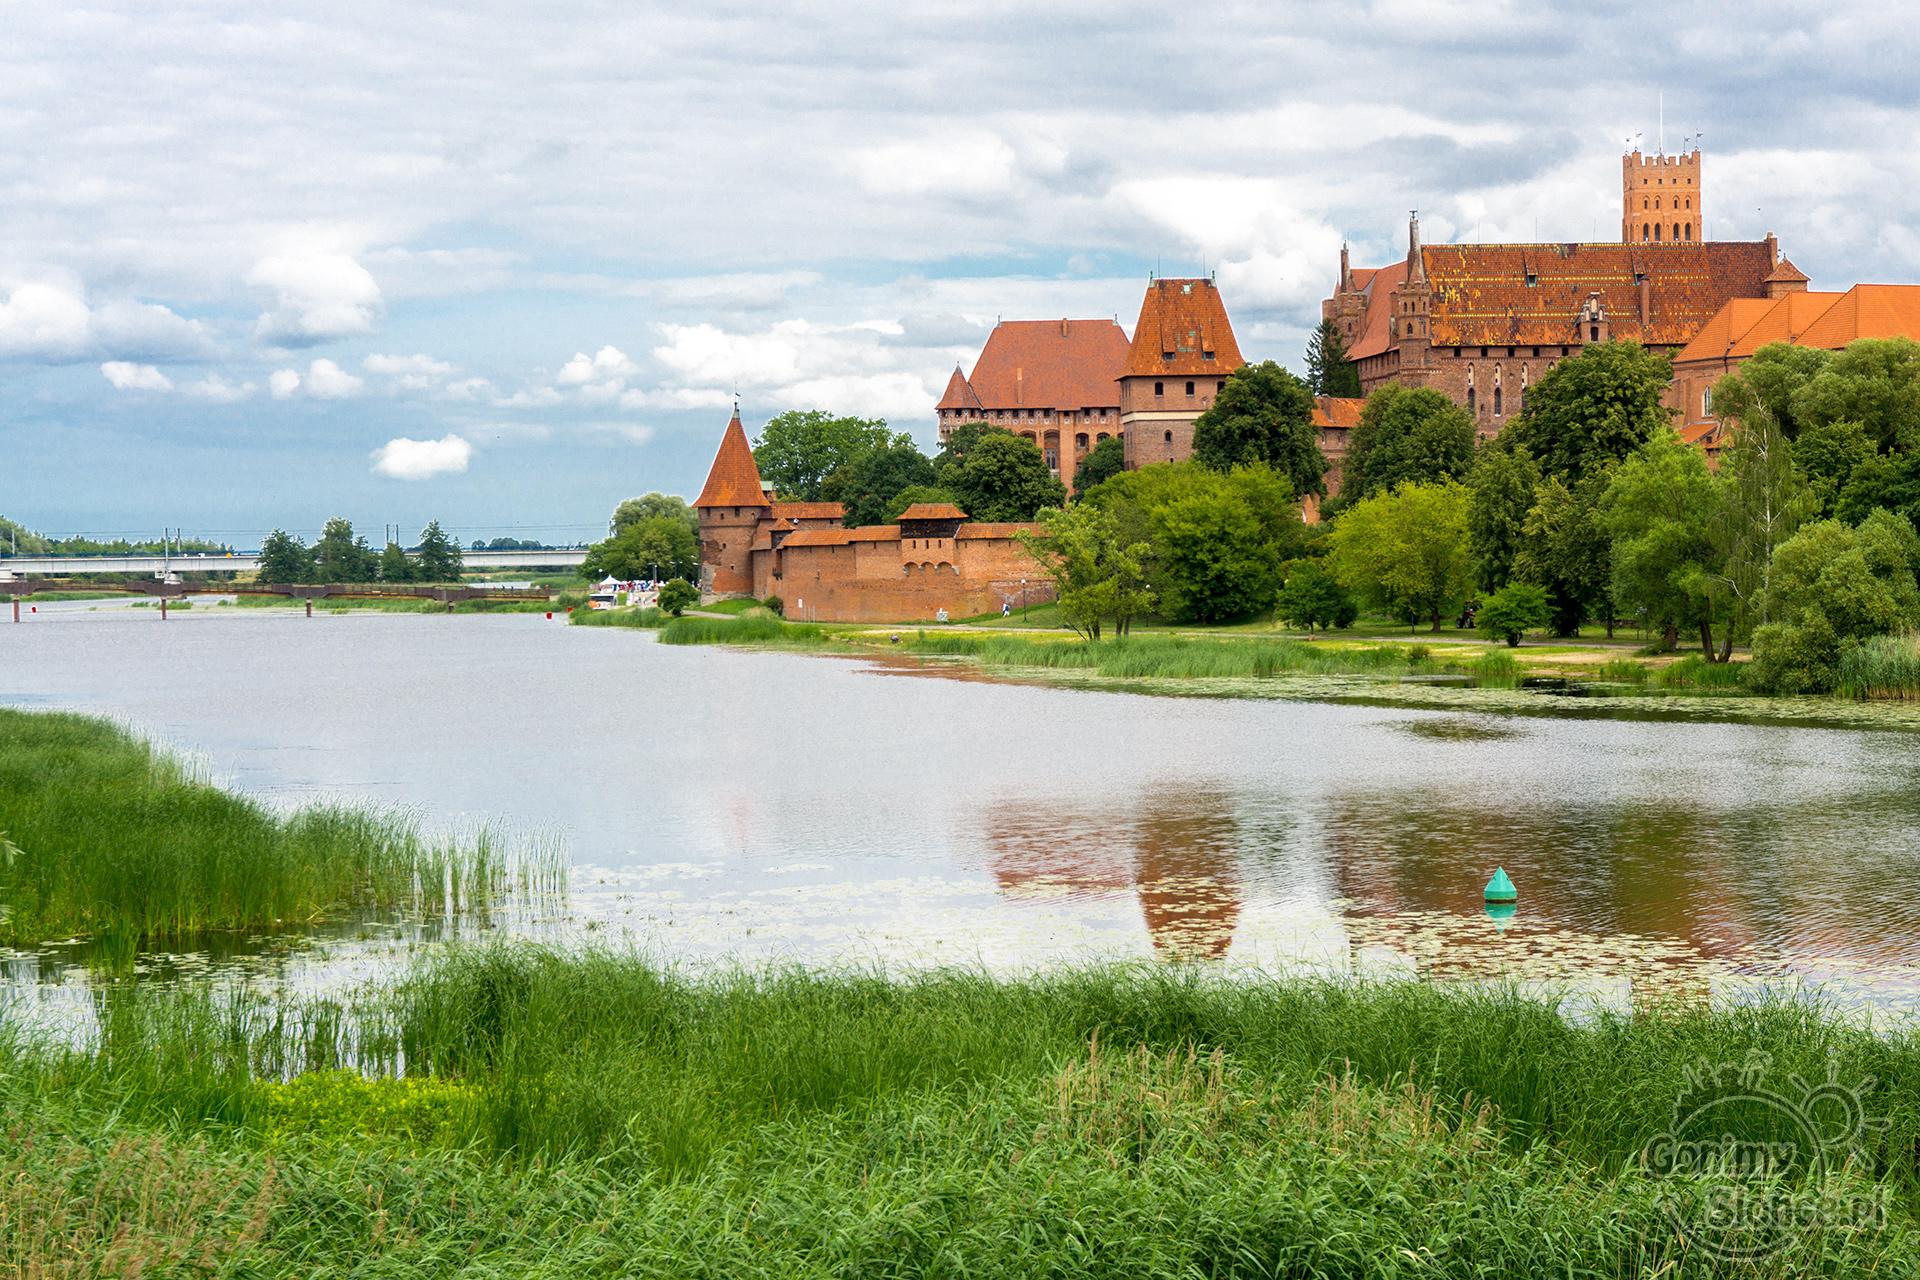 Malbork przejazdem rowerem | widok na zamek w Malborku